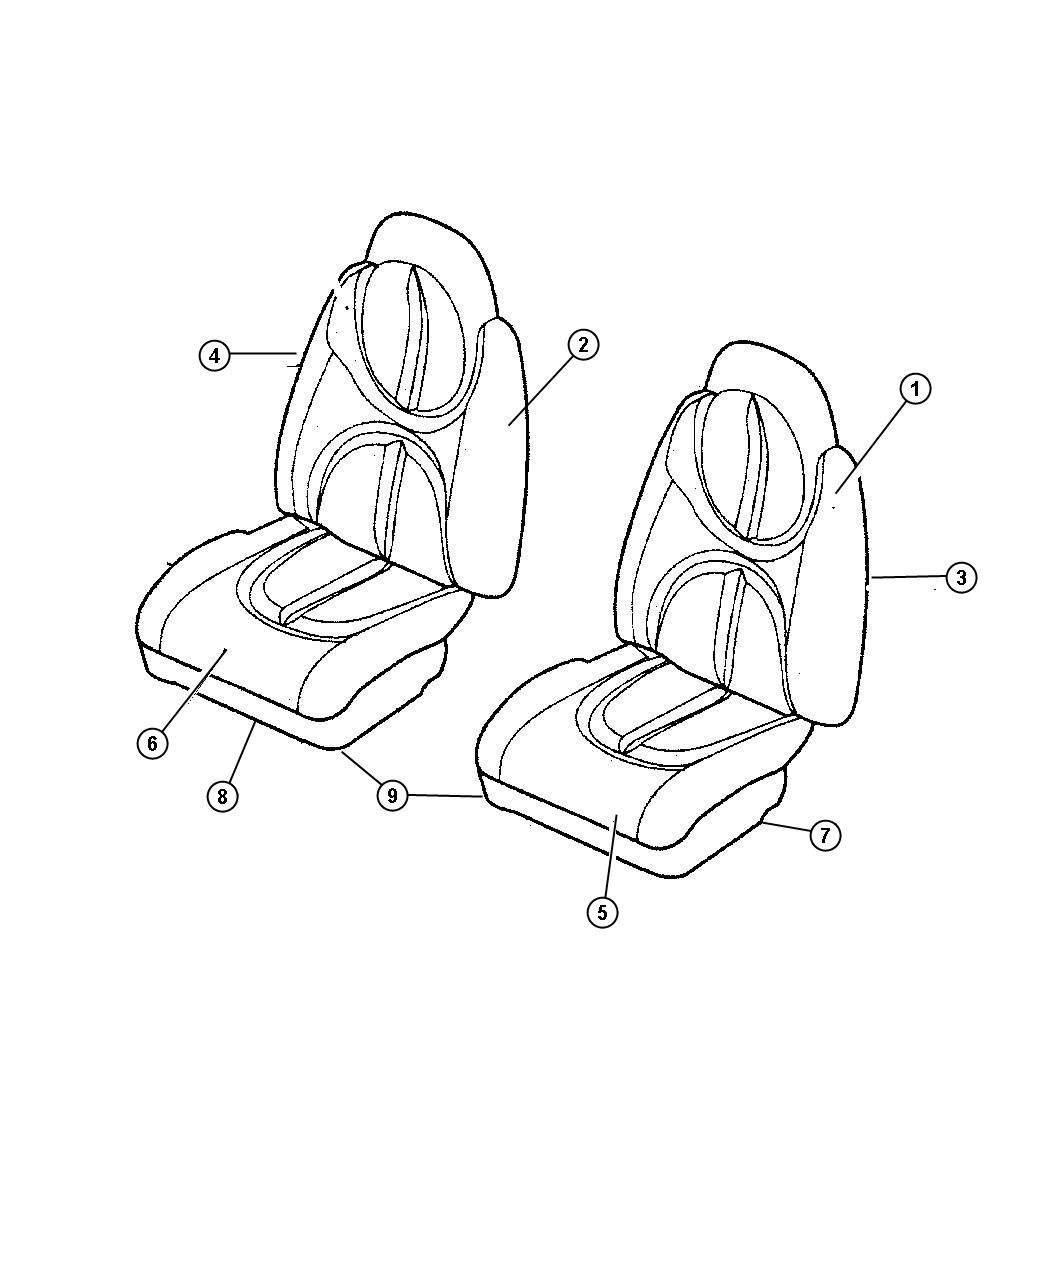 Dodge Durango Cover Front Seat Cushion T5 Trim